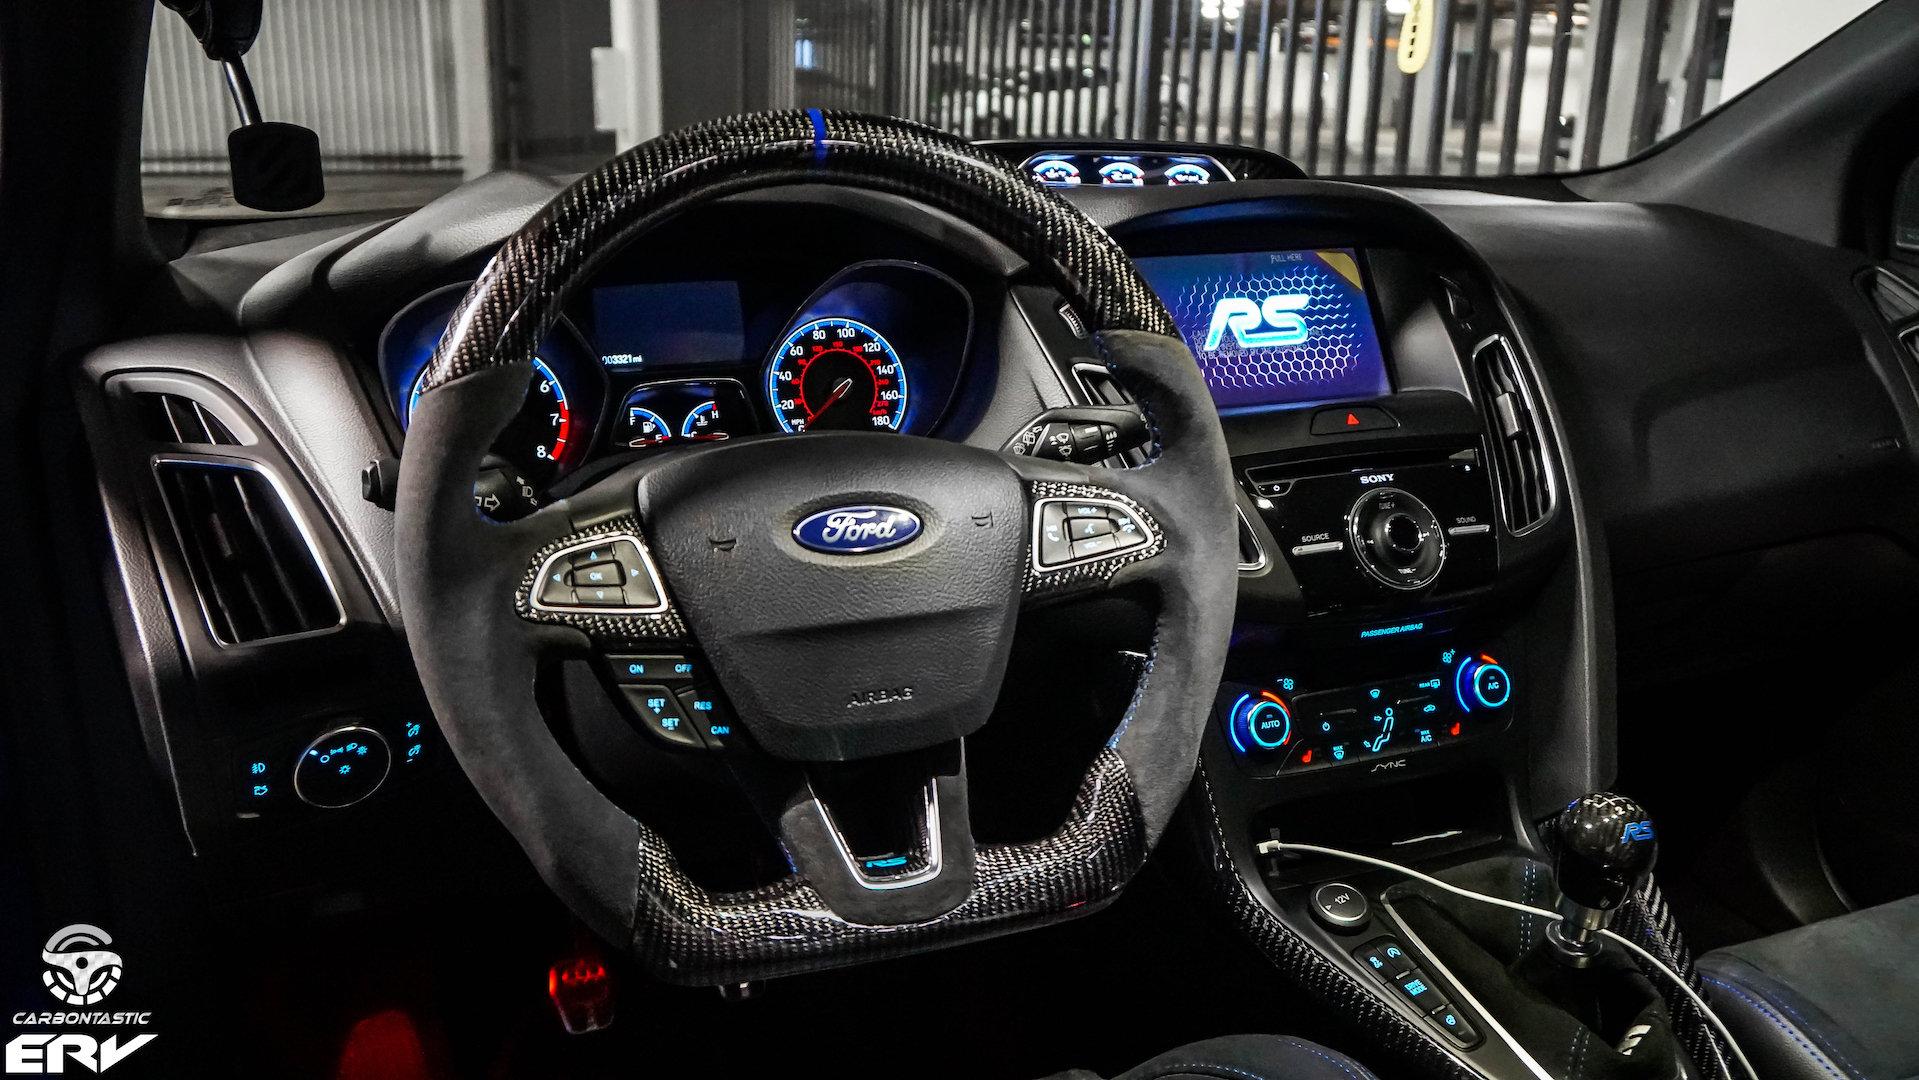 Custom Focus St >> 2015 Ford Focus St Rs Custom Carbon Fiber Steering Wheel Carbontastic